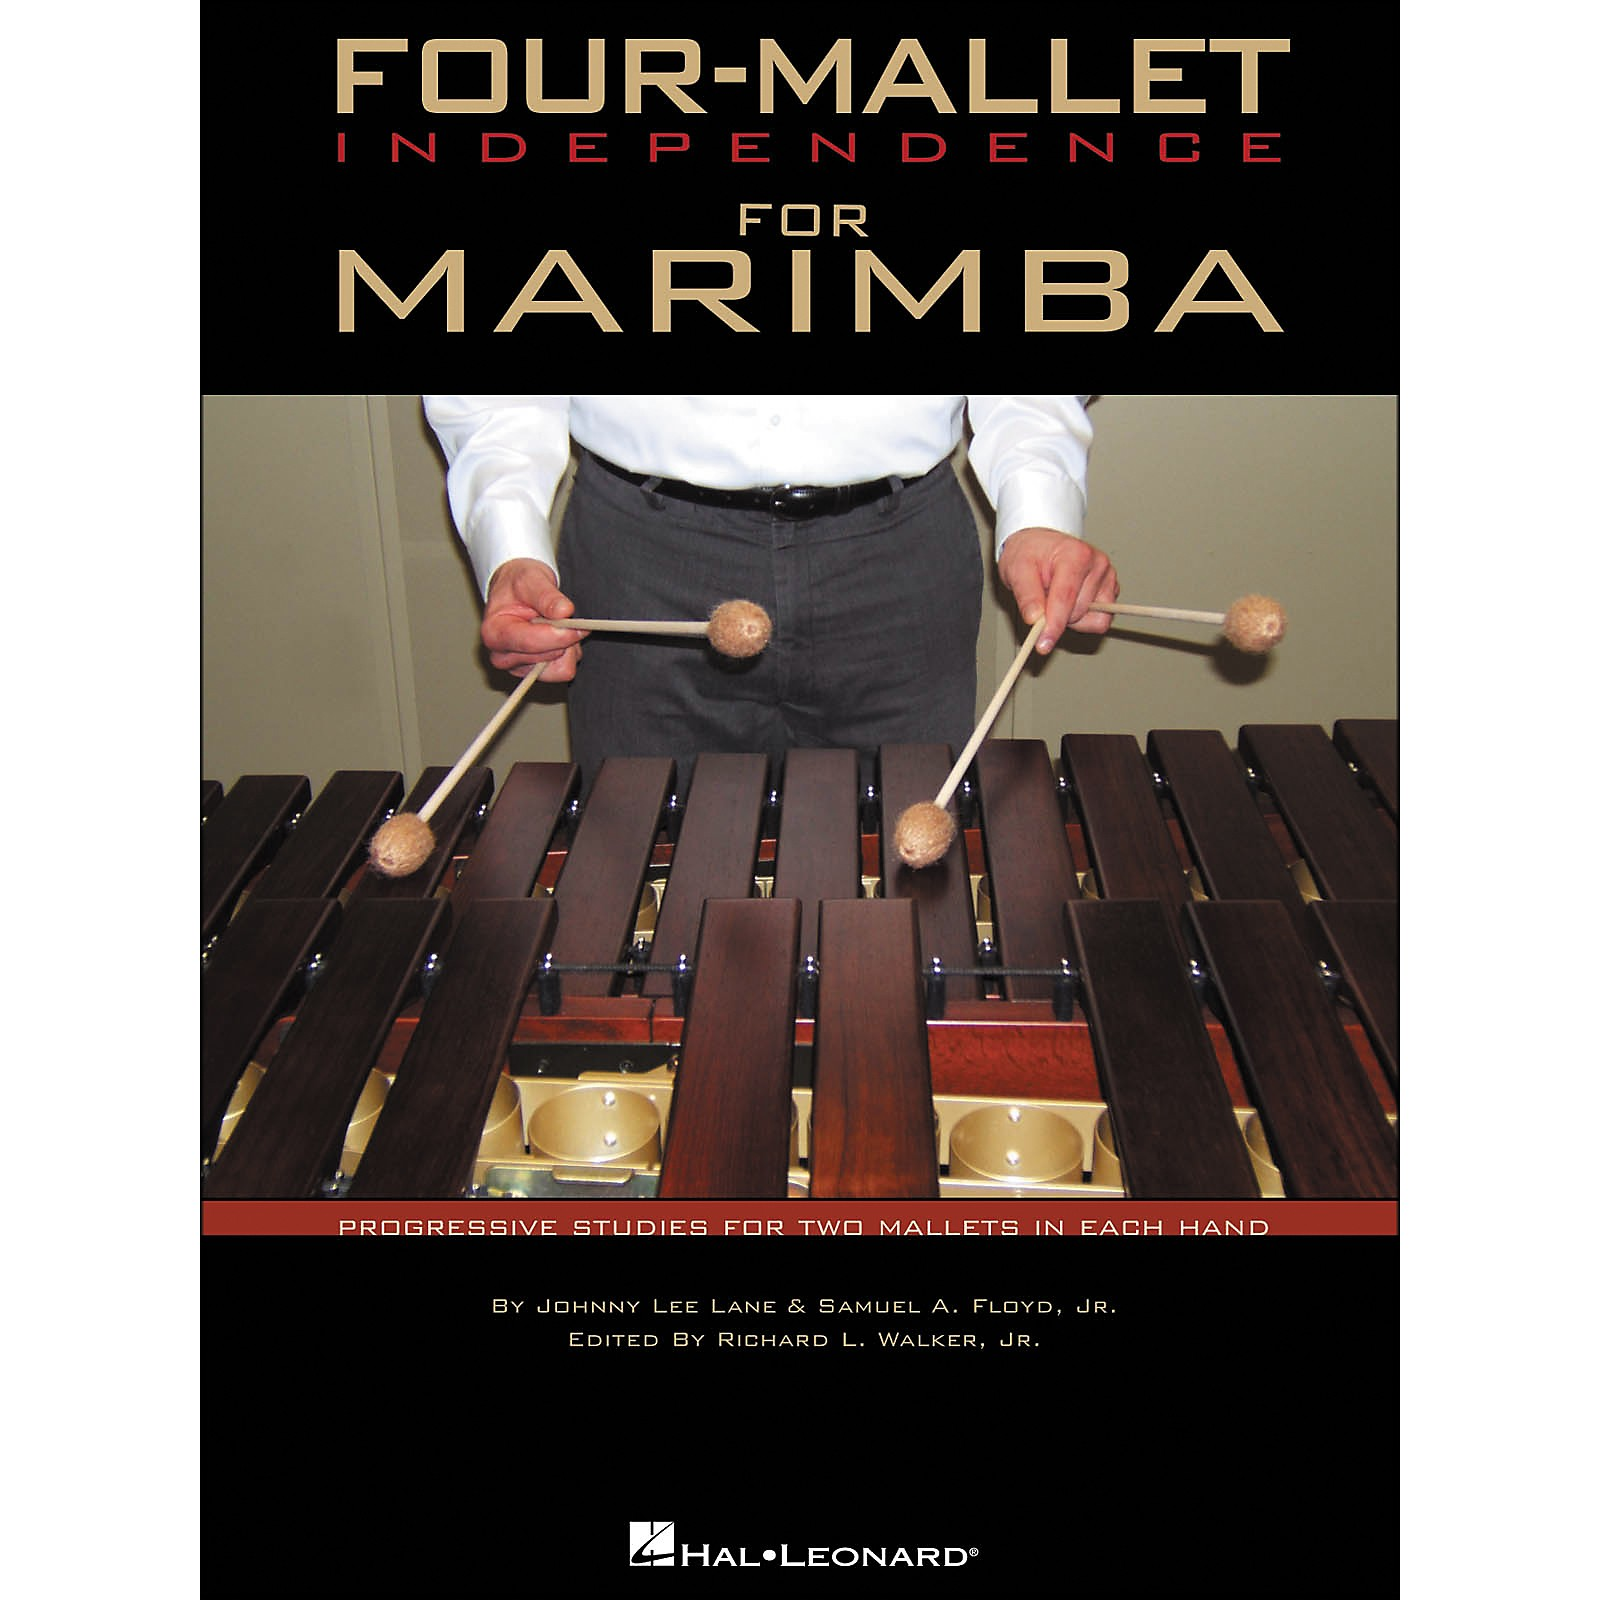 Hal Leonard Four Mallet Independence for Marimba